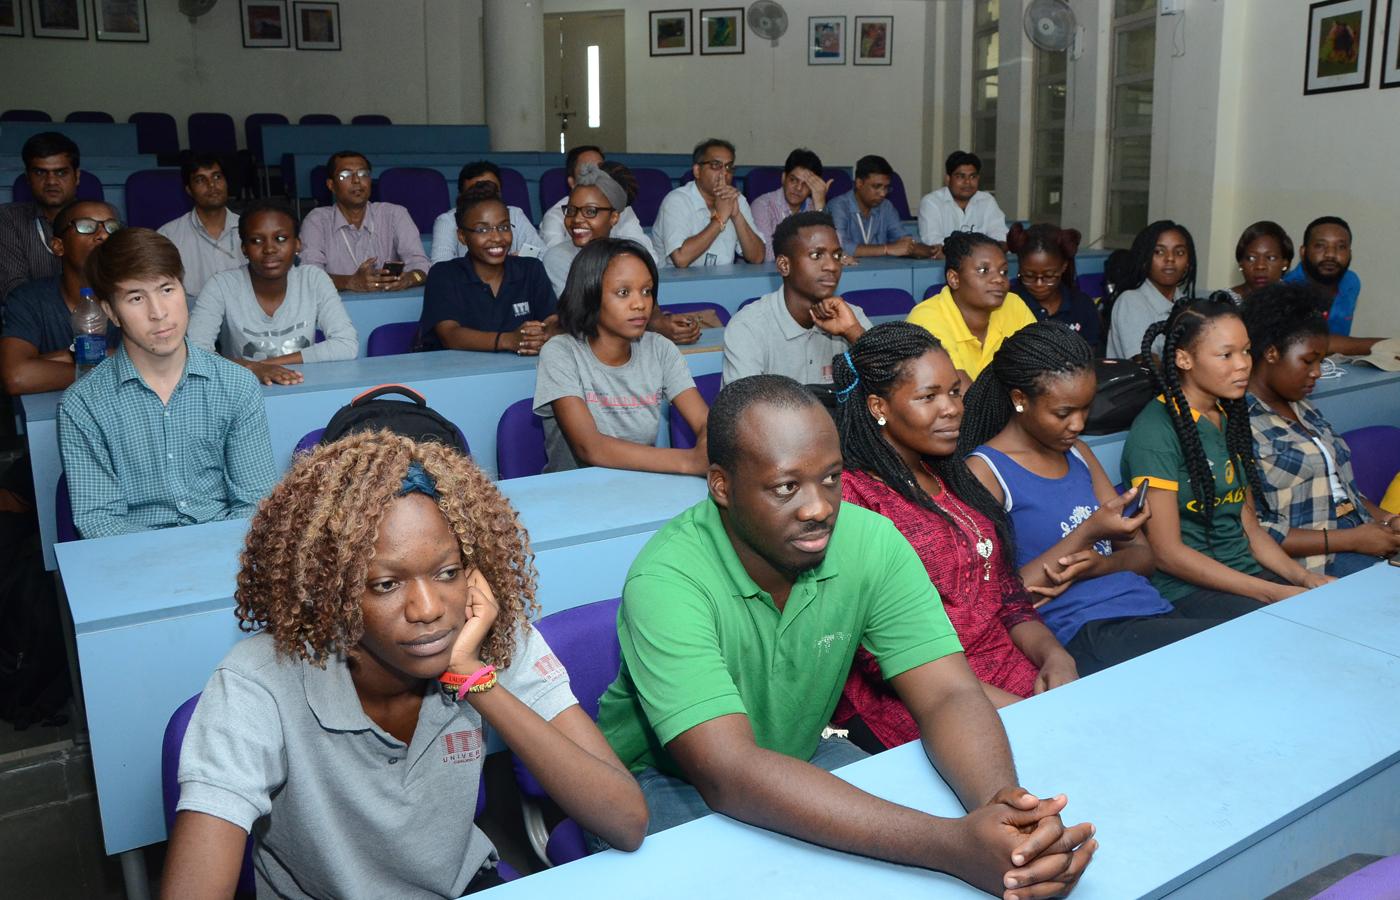 studenti ivoriani